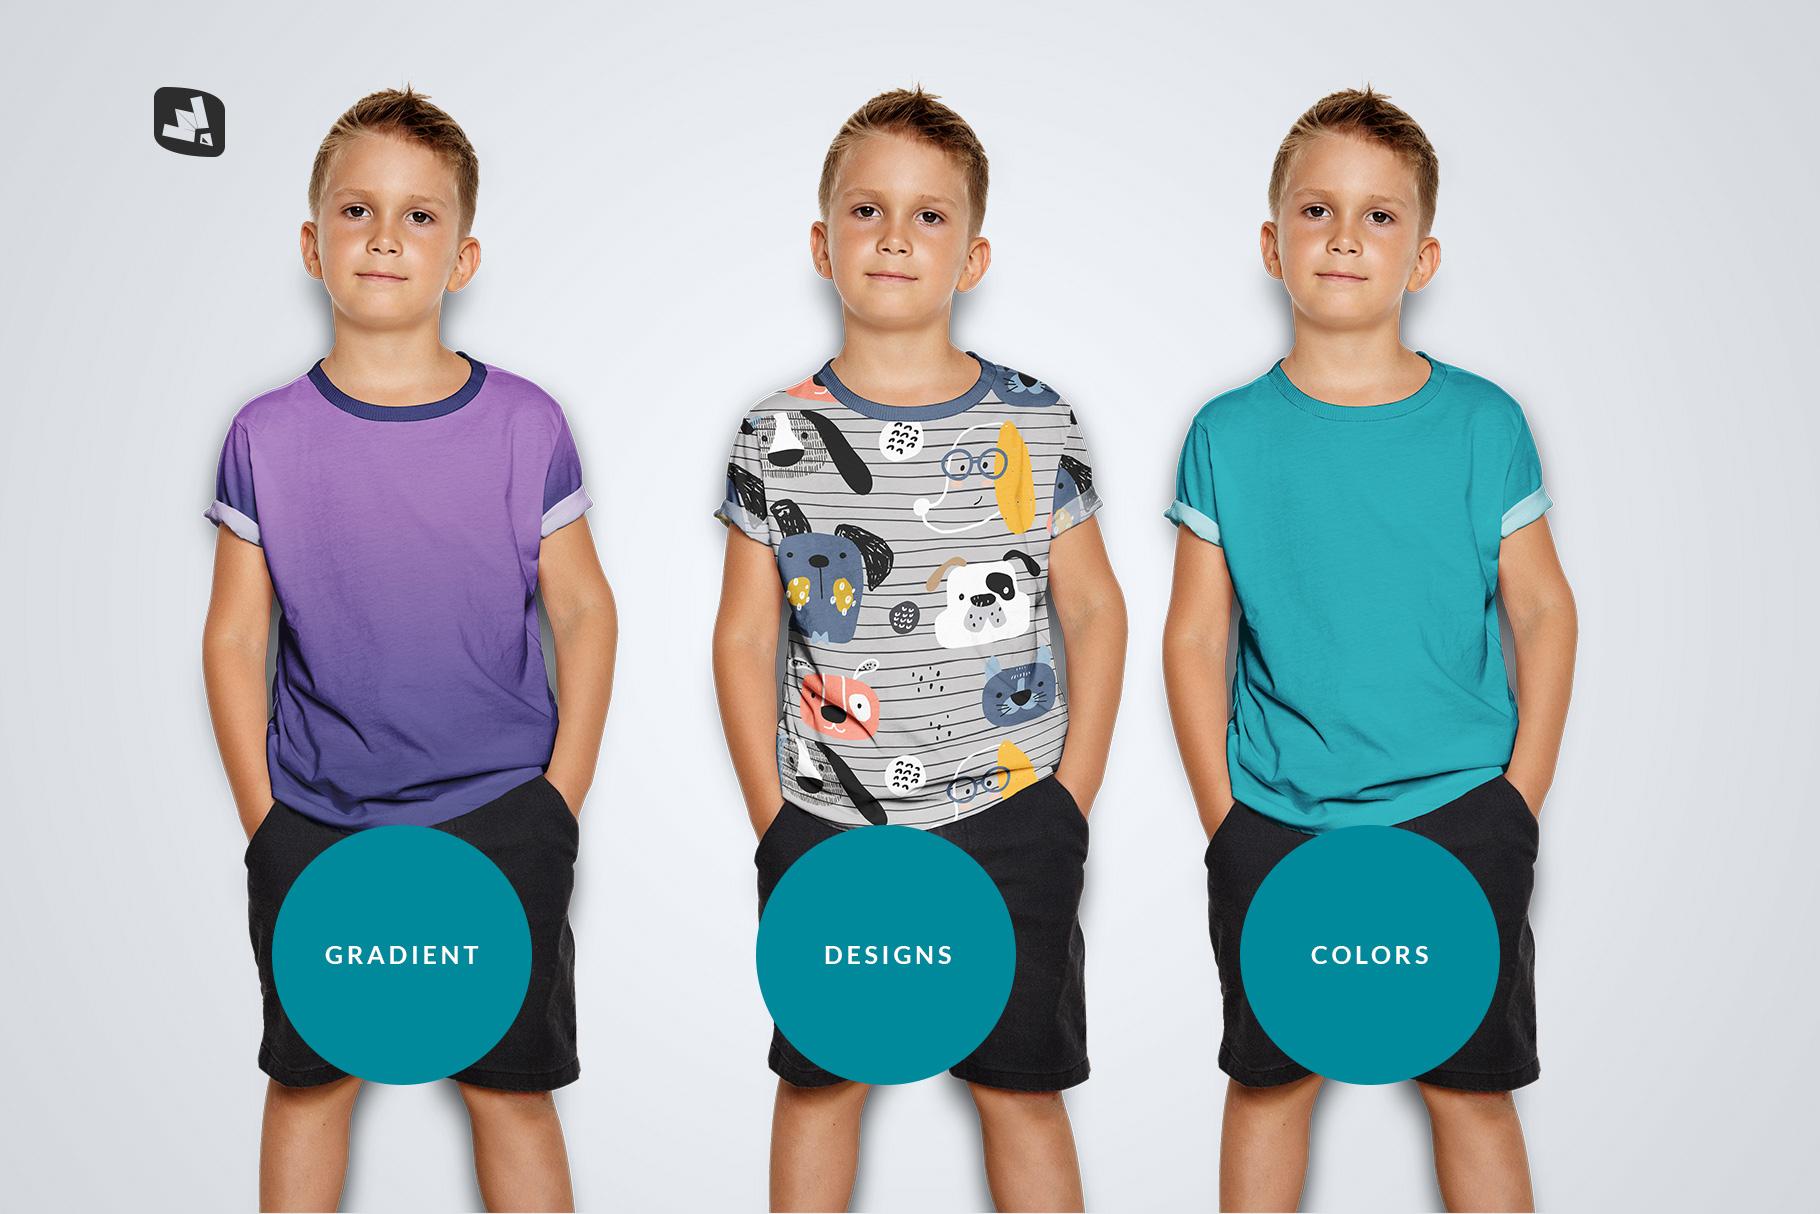 types of the kid's half sleeve tshirt mockup